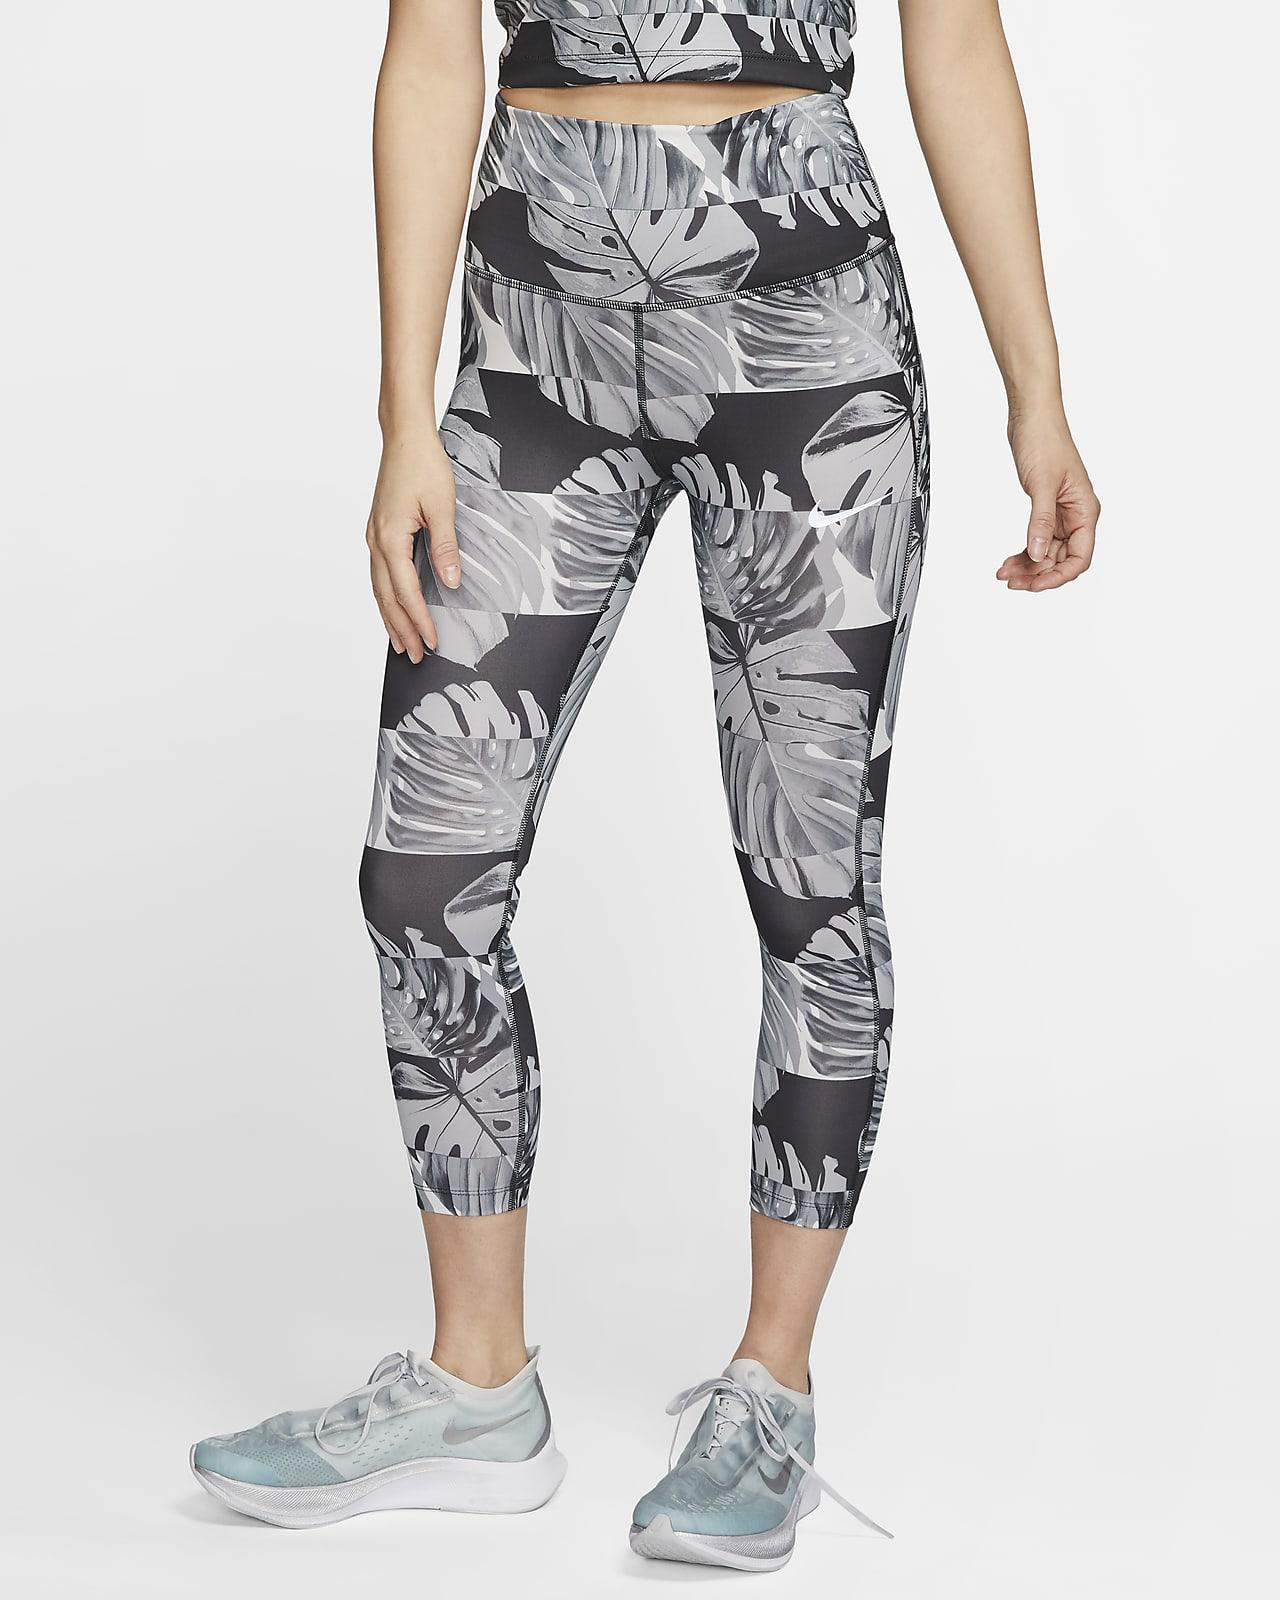 Nike Fast Women's High-Waisted Crop Printed Running Leggings